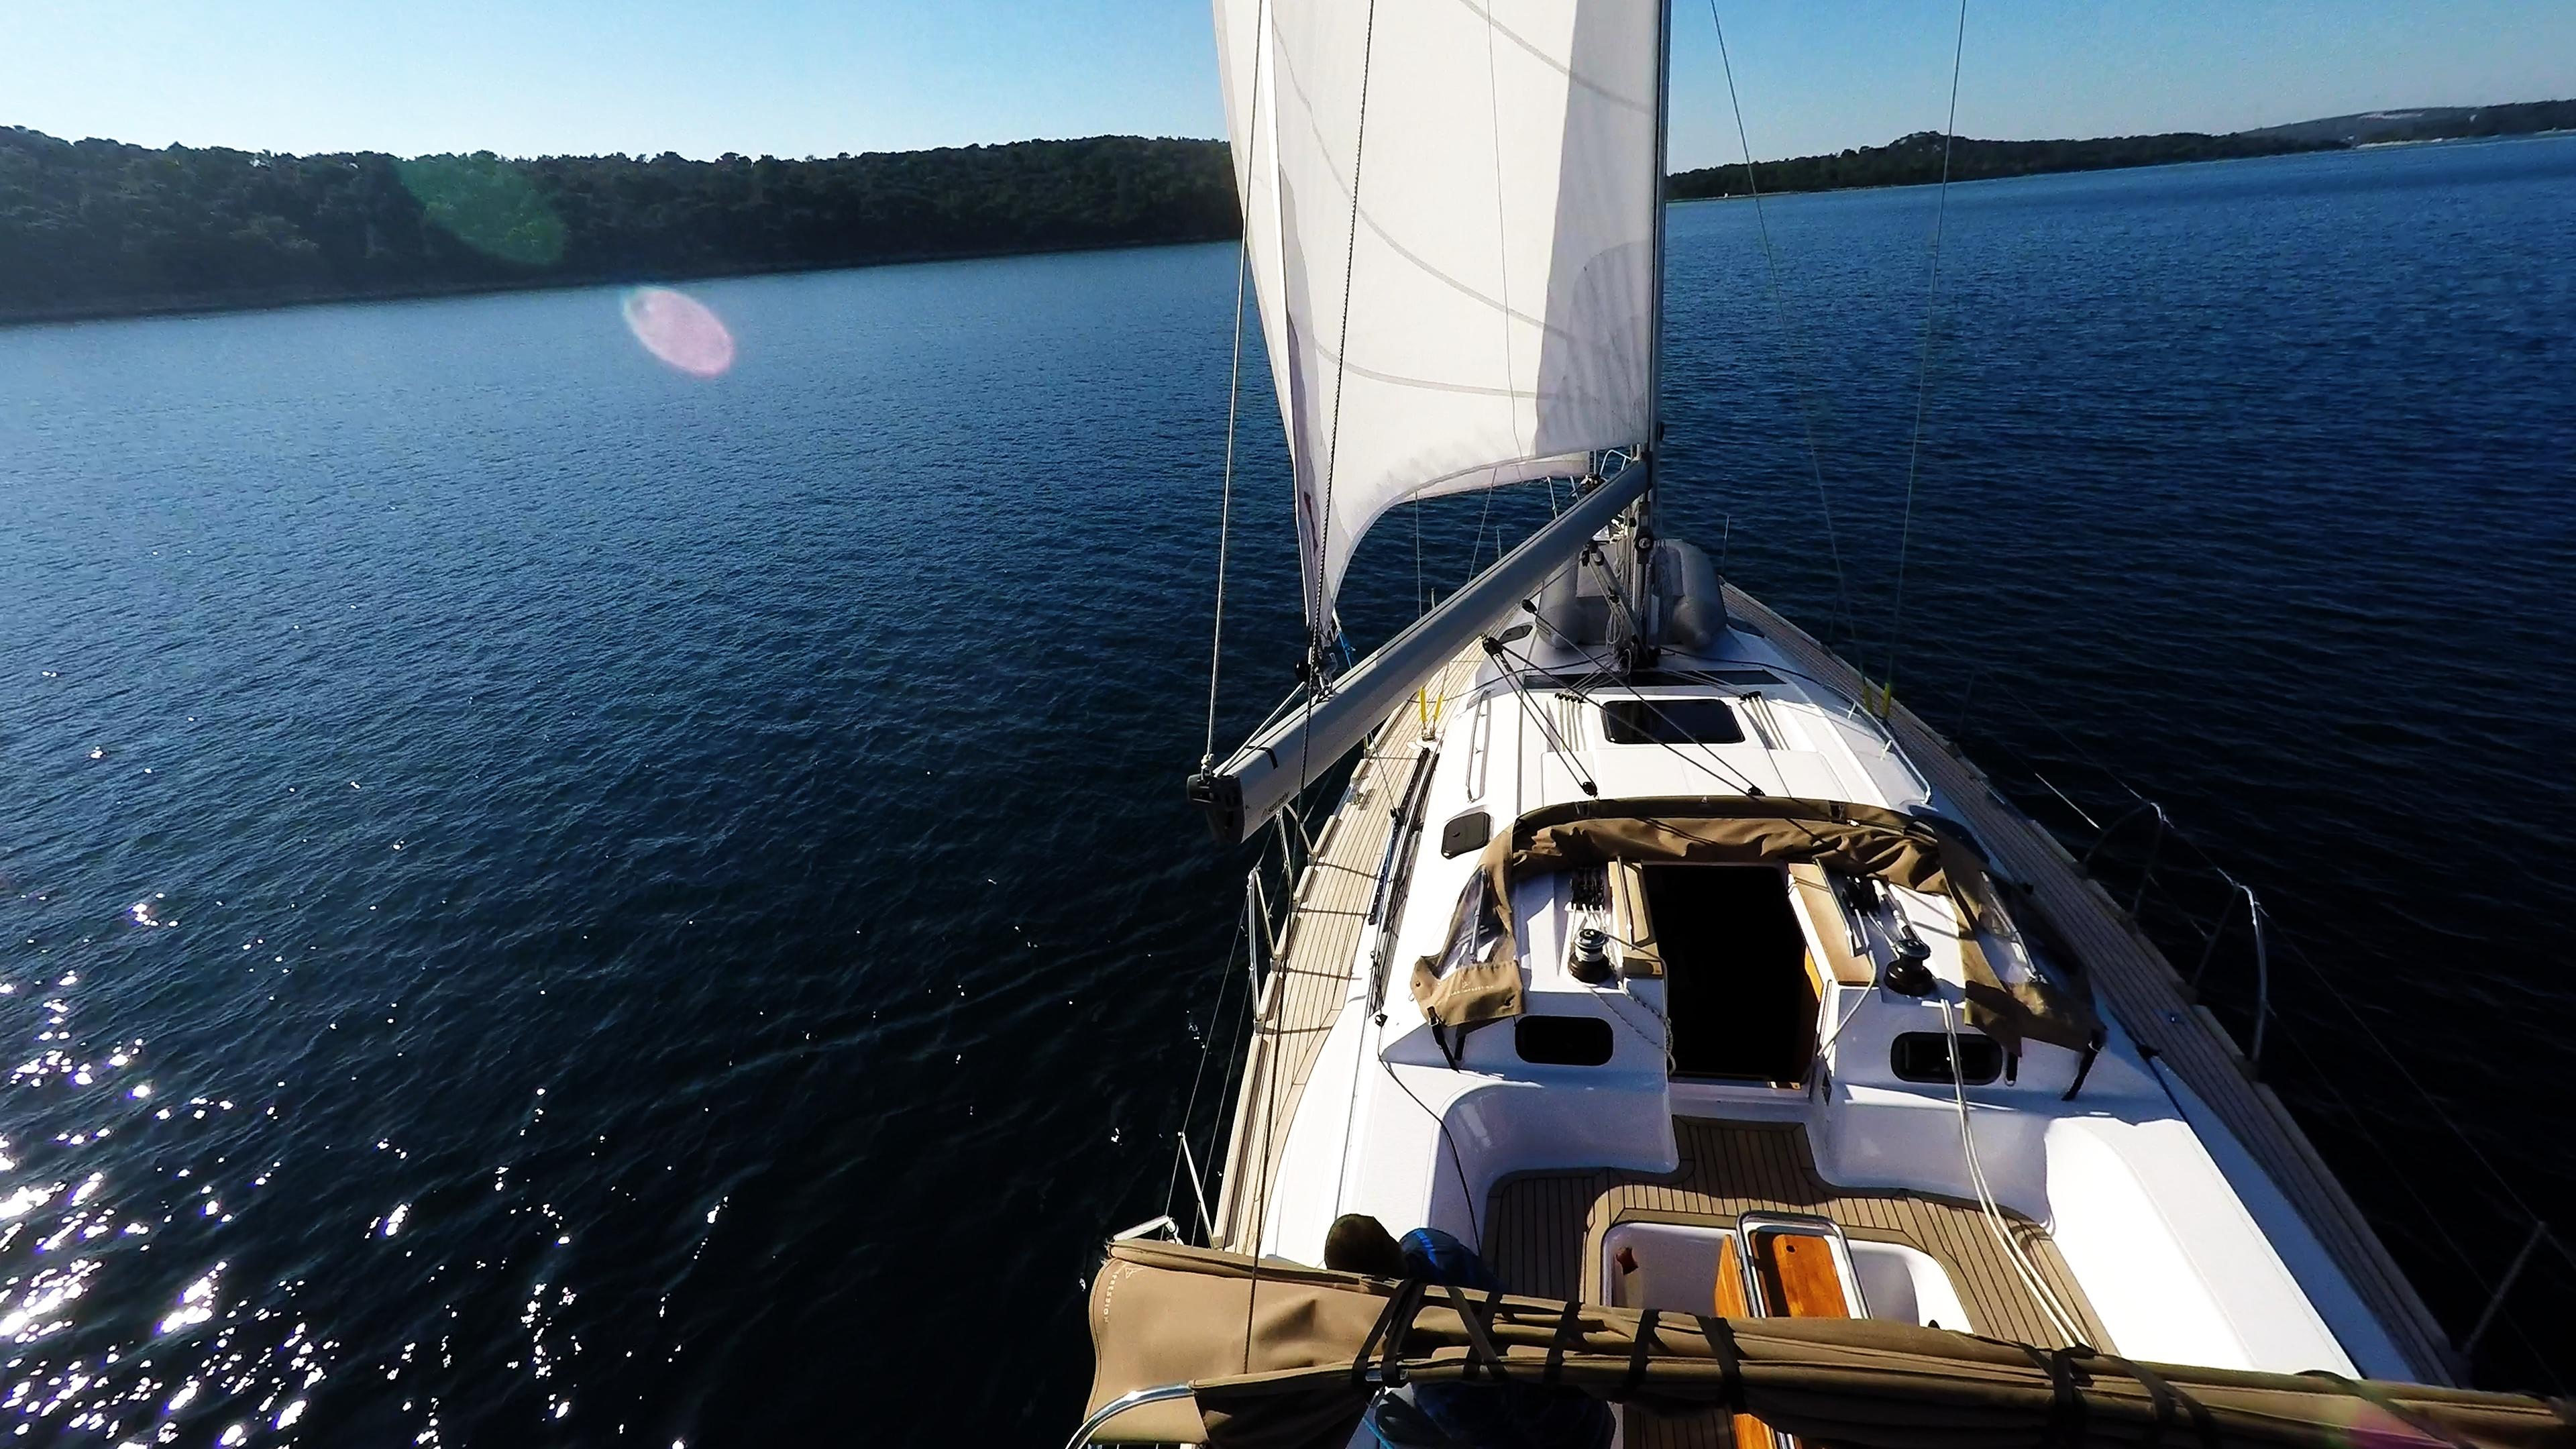 barcha a vela copertain teak per barche a vela vele yacht a vela elan 45 impression